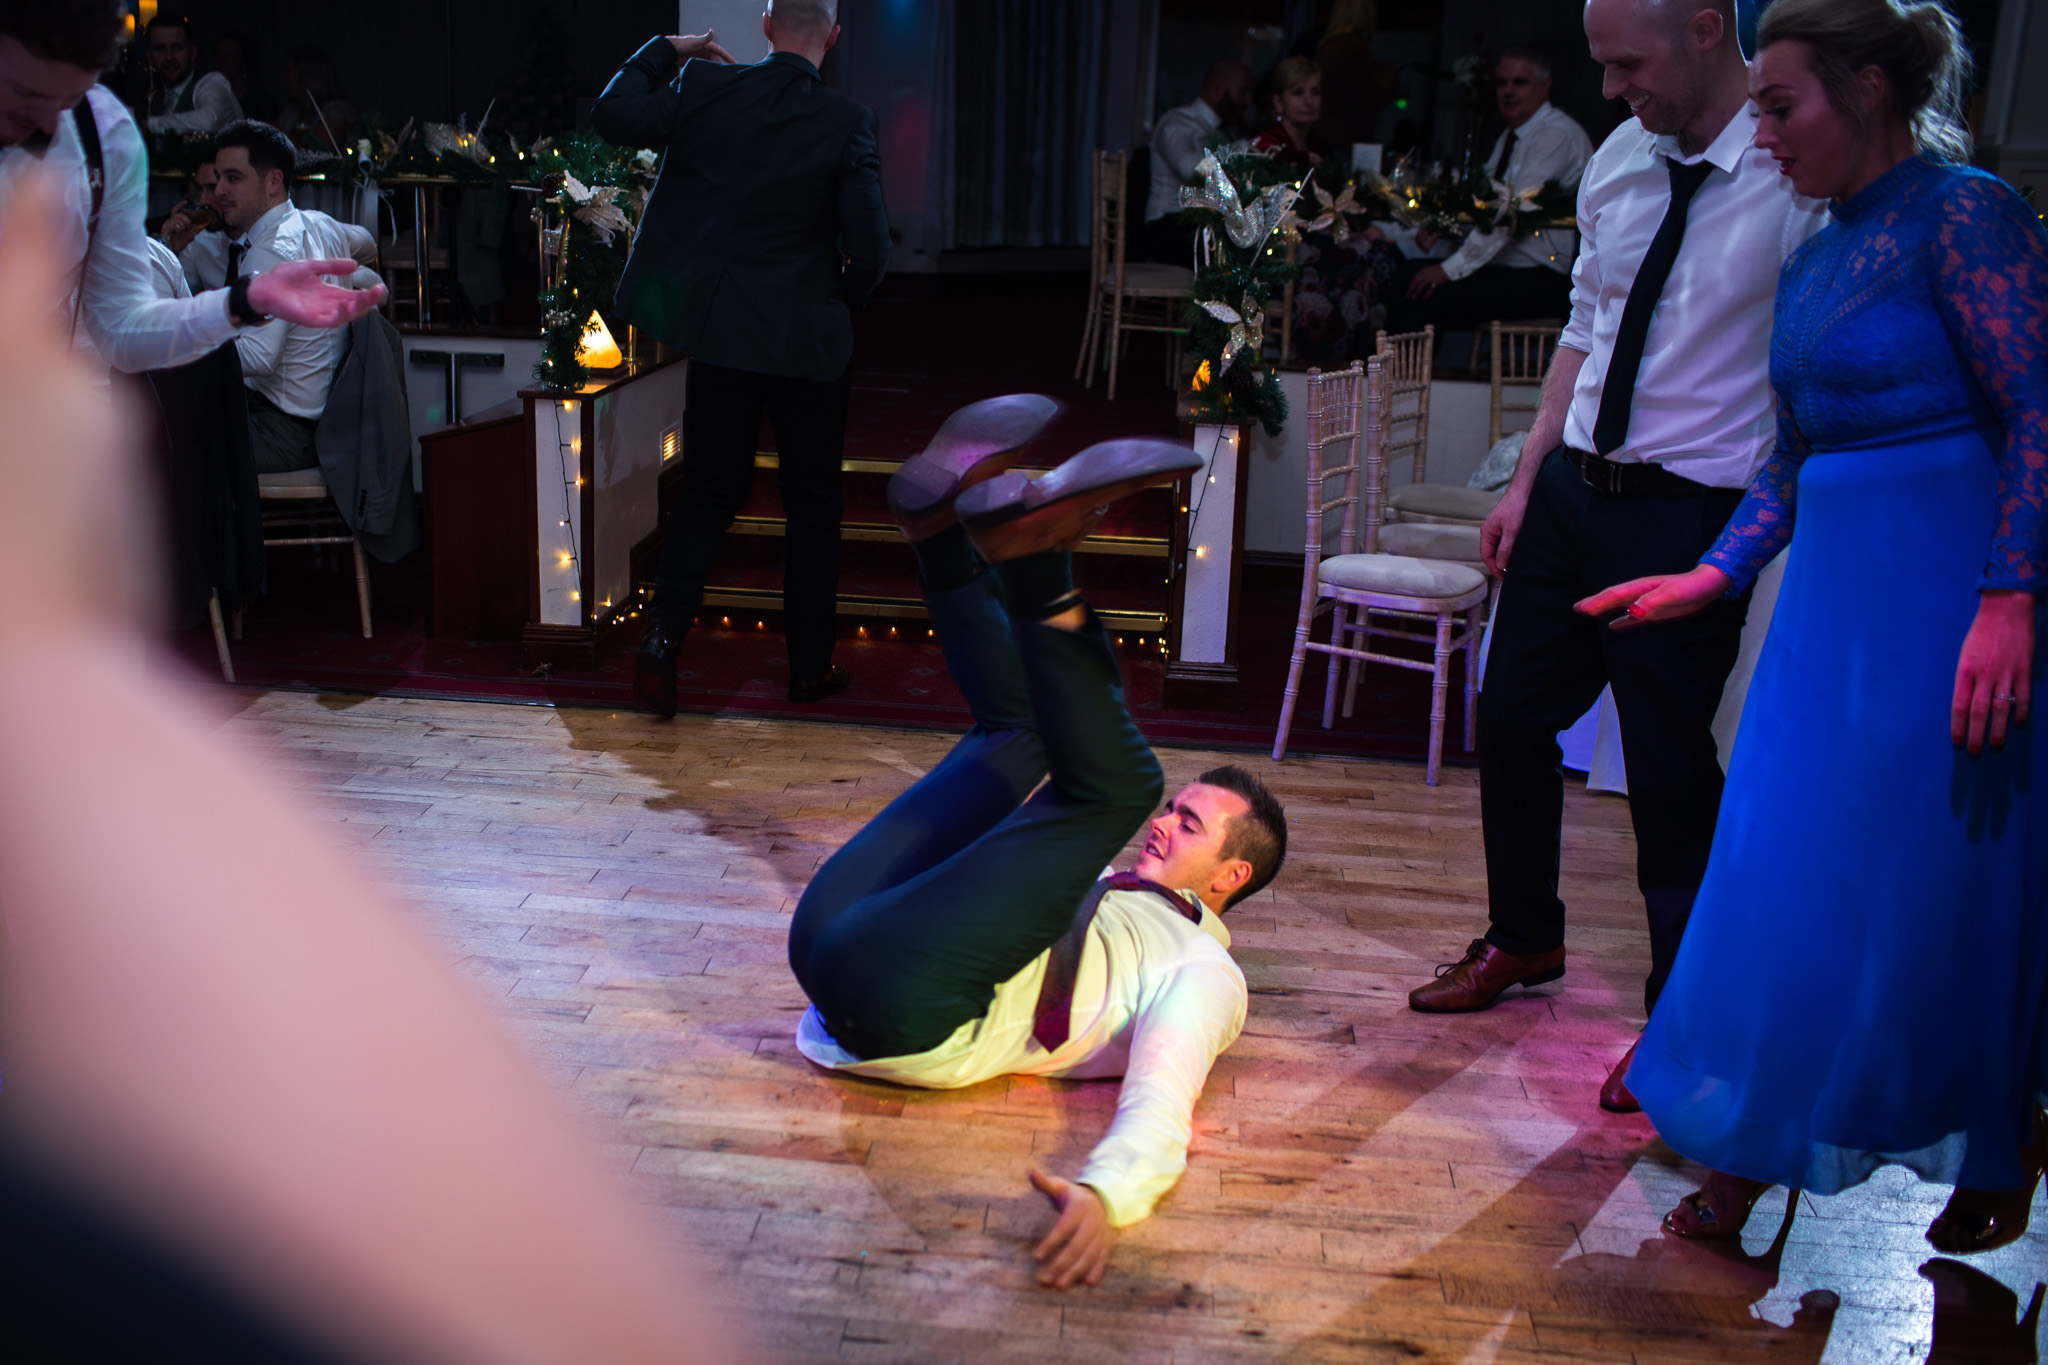 Mark_Barnes_Northern_Ireland_wedding_photographer_Harveys_Point_Donegall_Wedding_photography-Adam&Gemma-74.jpg